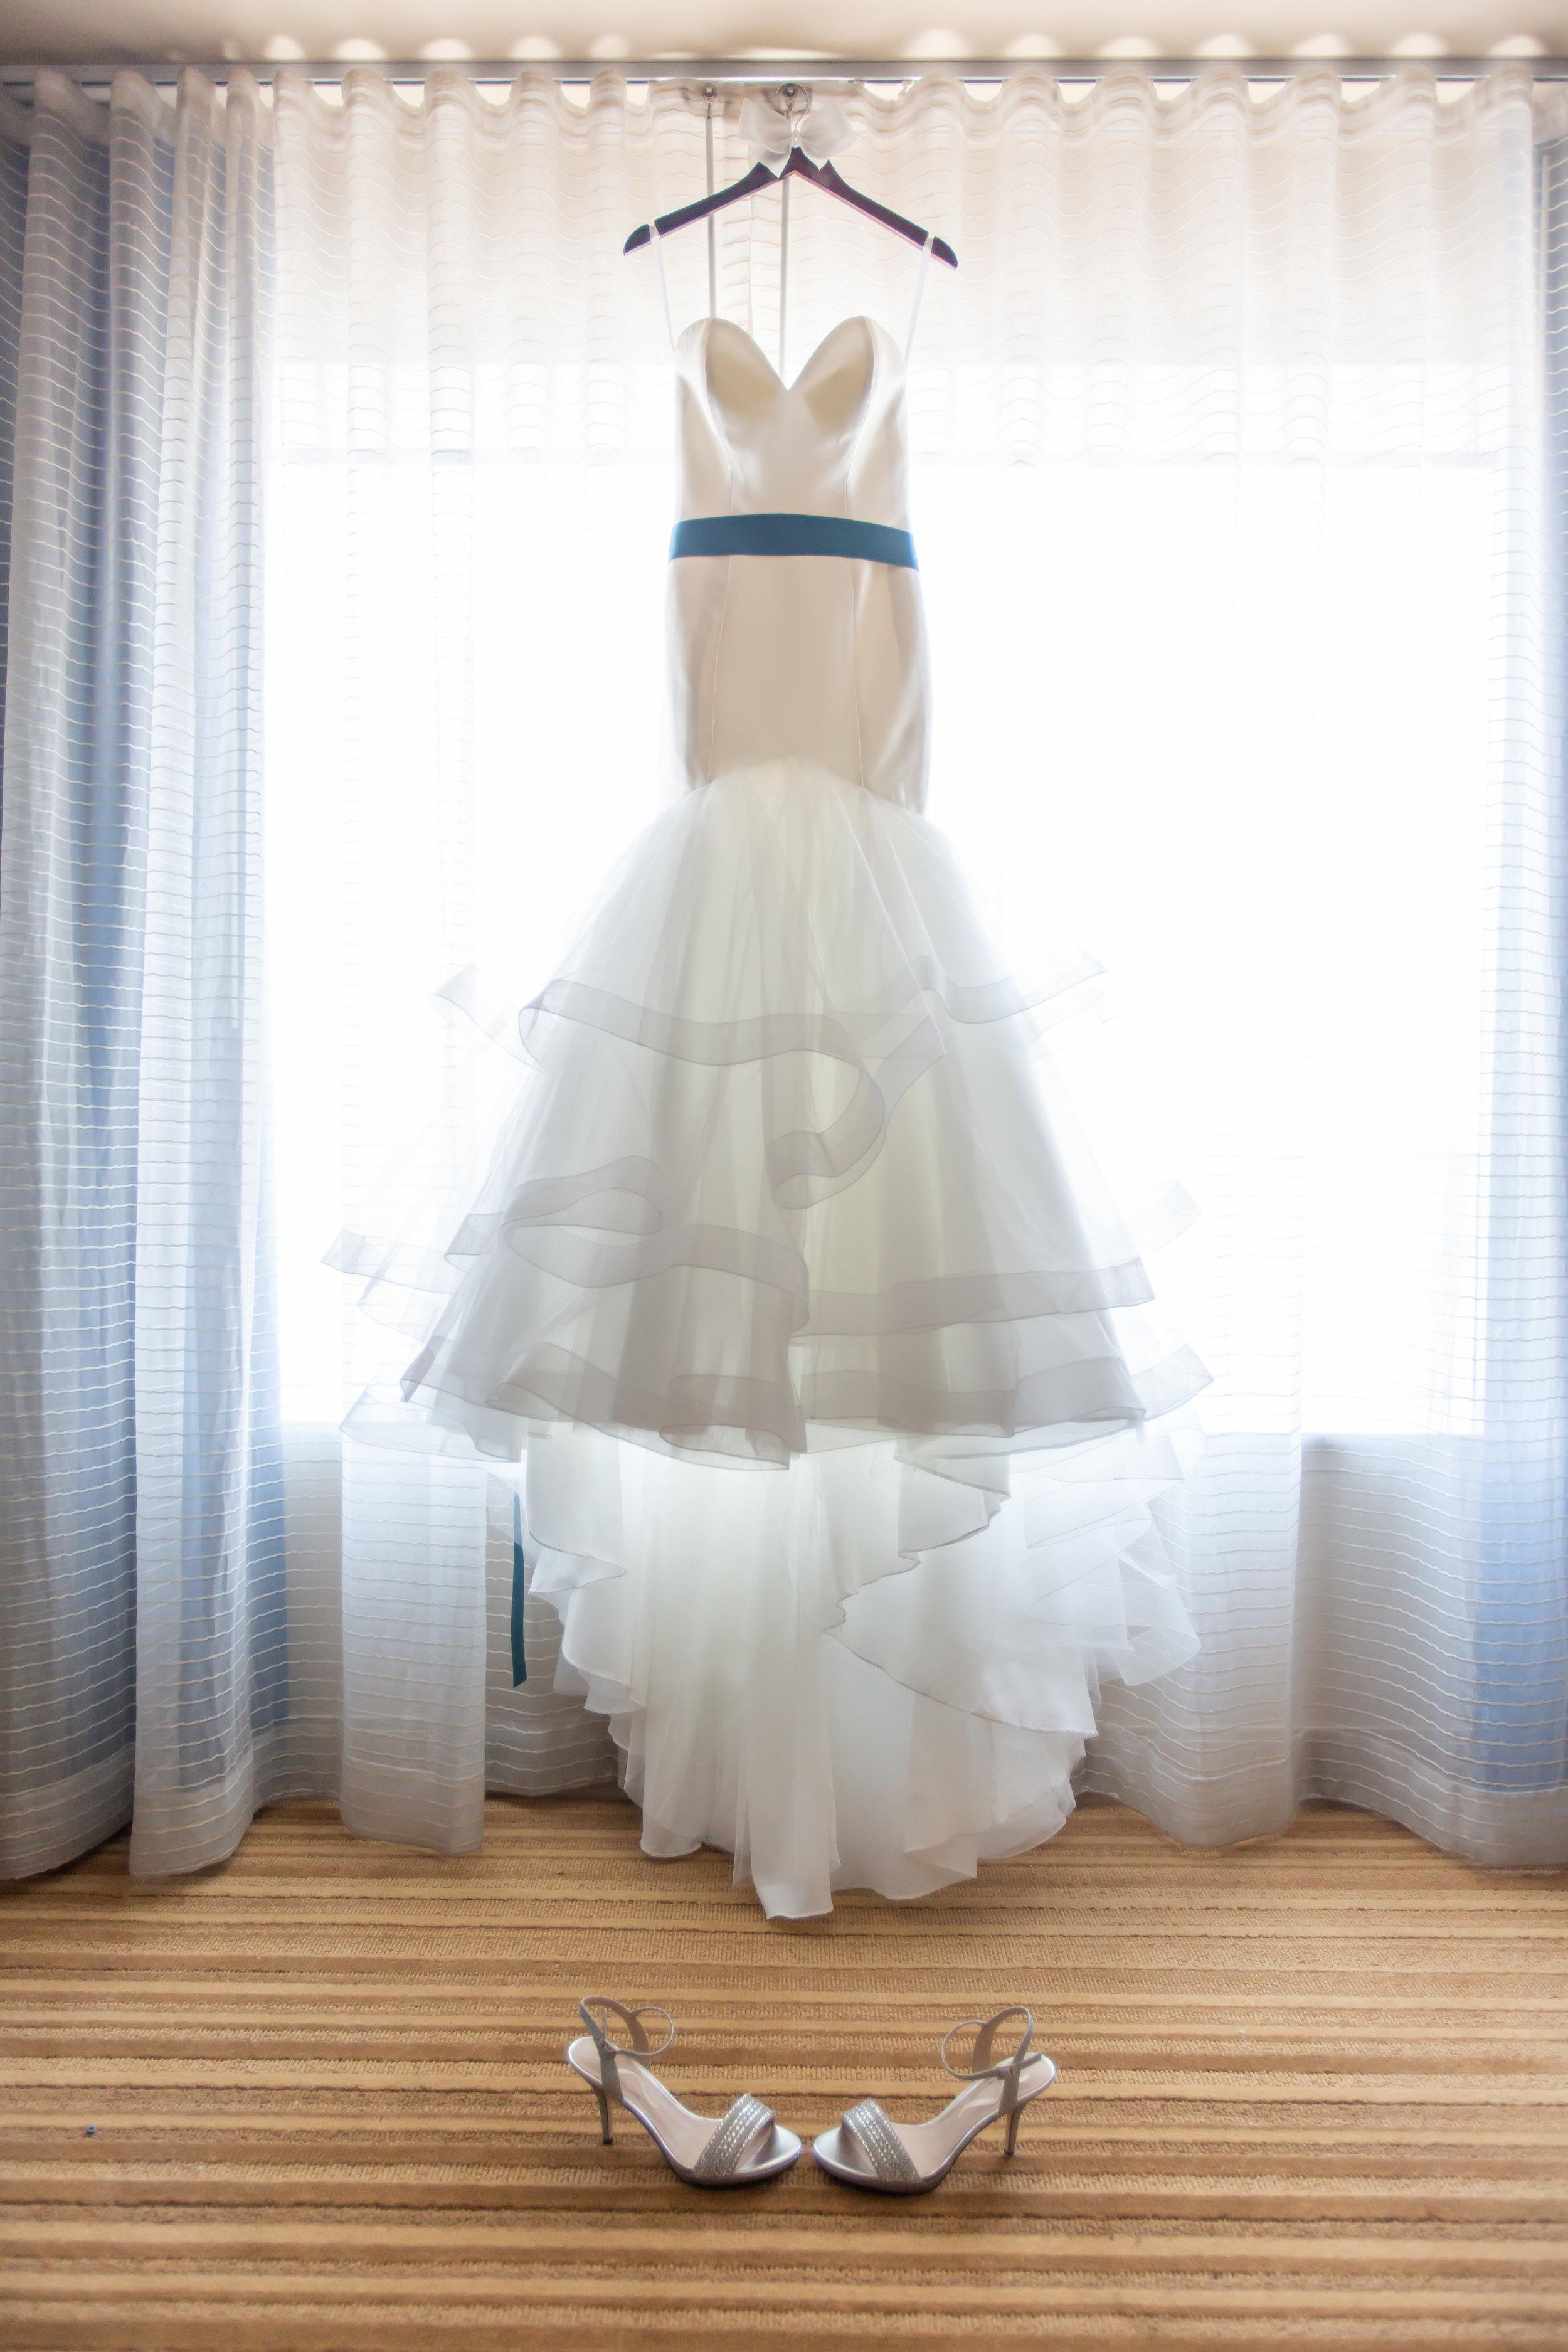 San-Diego-Wedding-Japanese-Friendship-Garden-Carla-David-2018-4.jpg